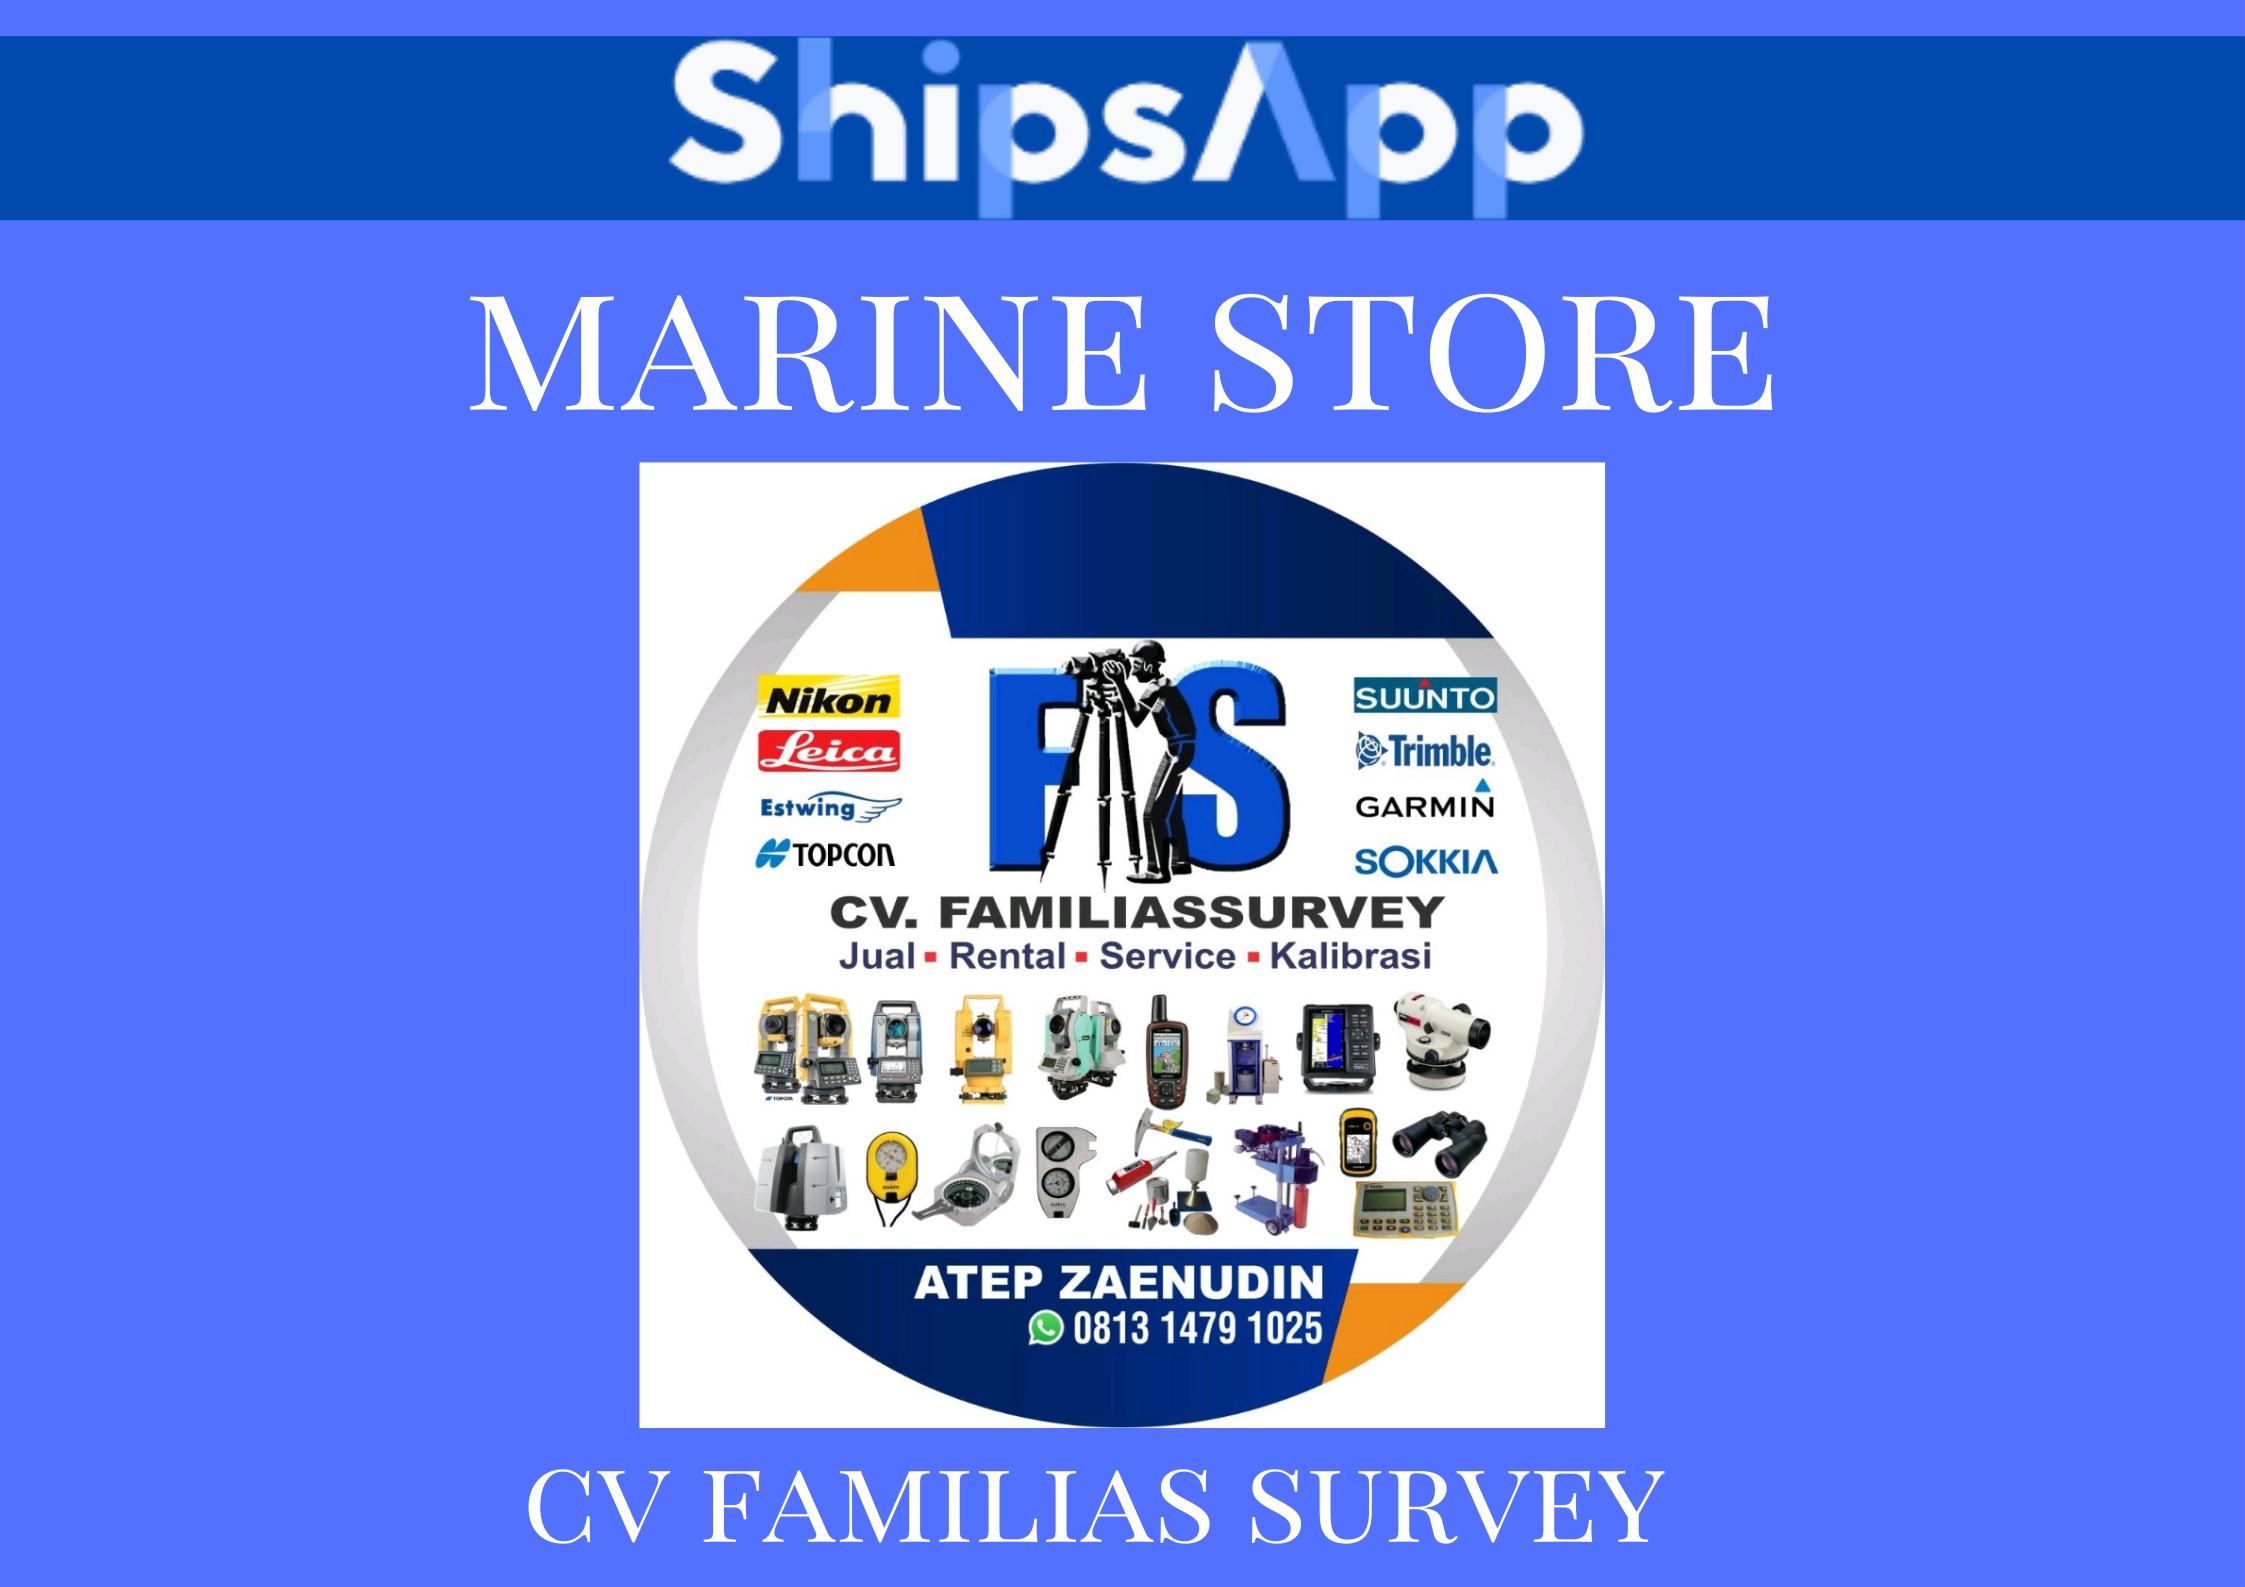 Marine Store CV Familias Survey